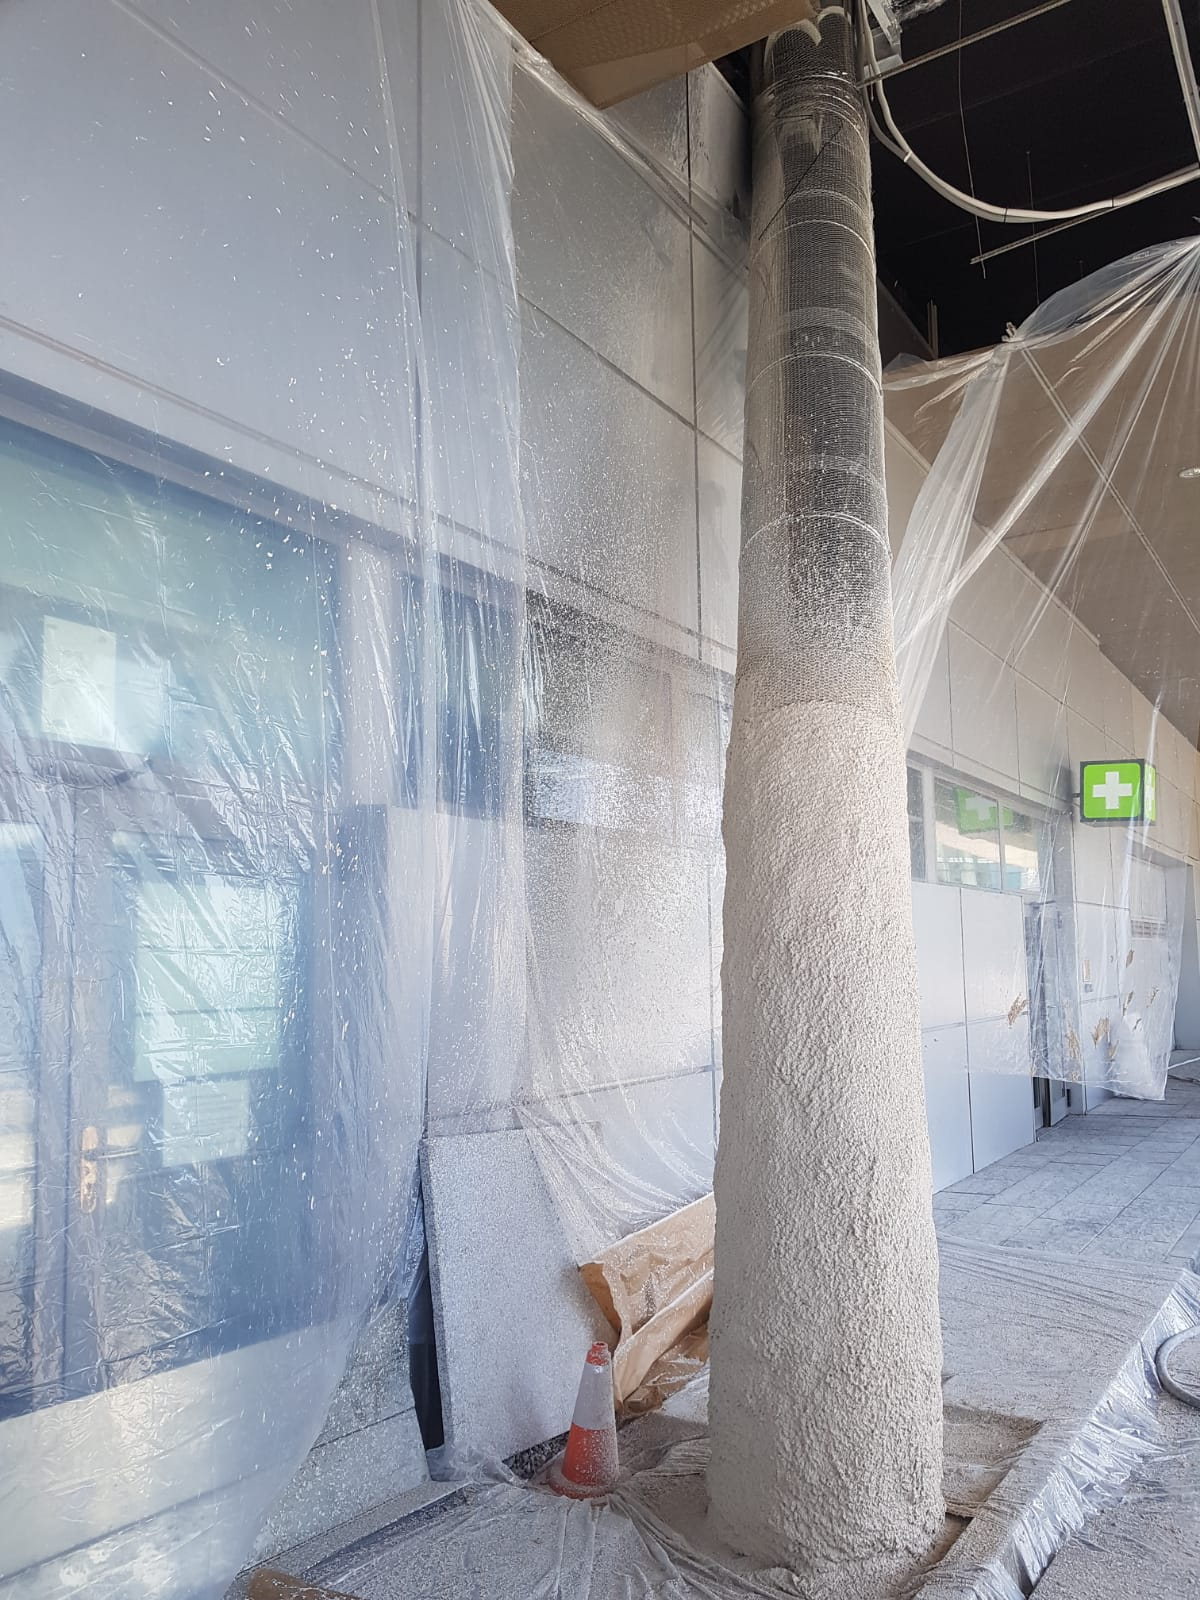 prtoteccion-de-tubos-aeropuerto-de-malaga-4.jpg